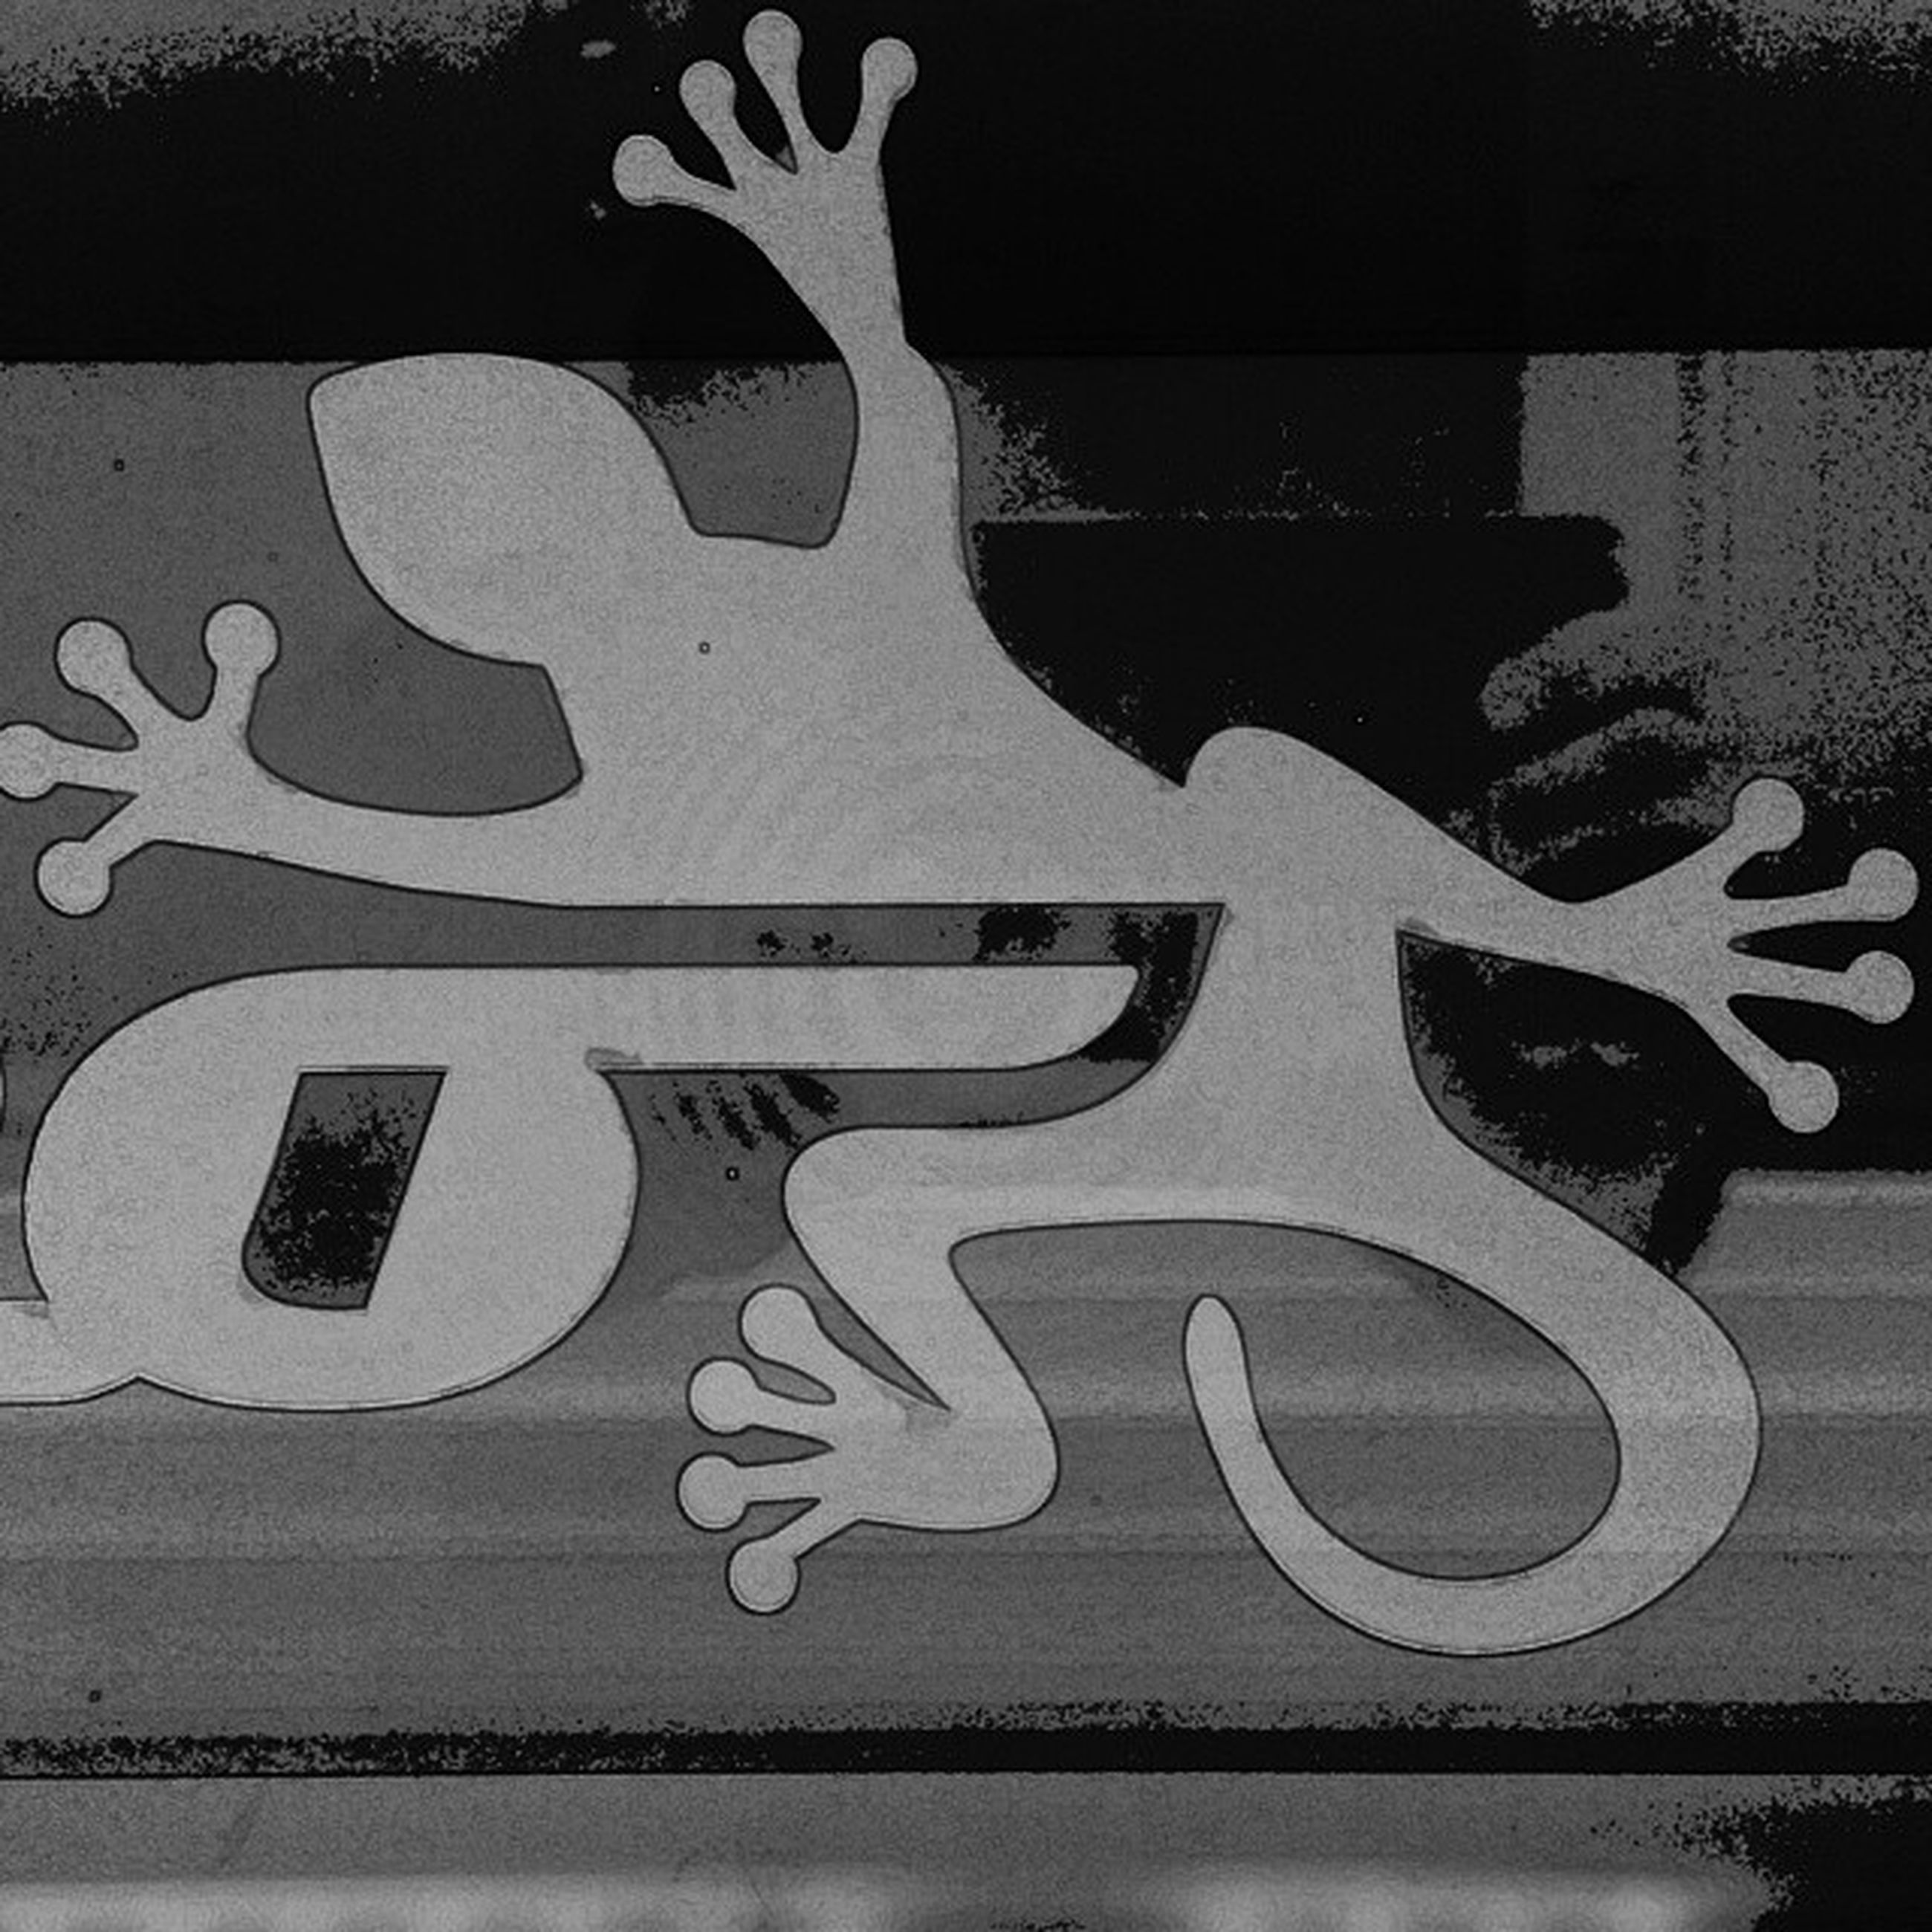 text, art, creativity, art and craft, graffiti, western script, human representation, communication, animal representation, wall - building feature, capital letter, street art, close-up, sign, wall, ideas, drawing - art product, no people